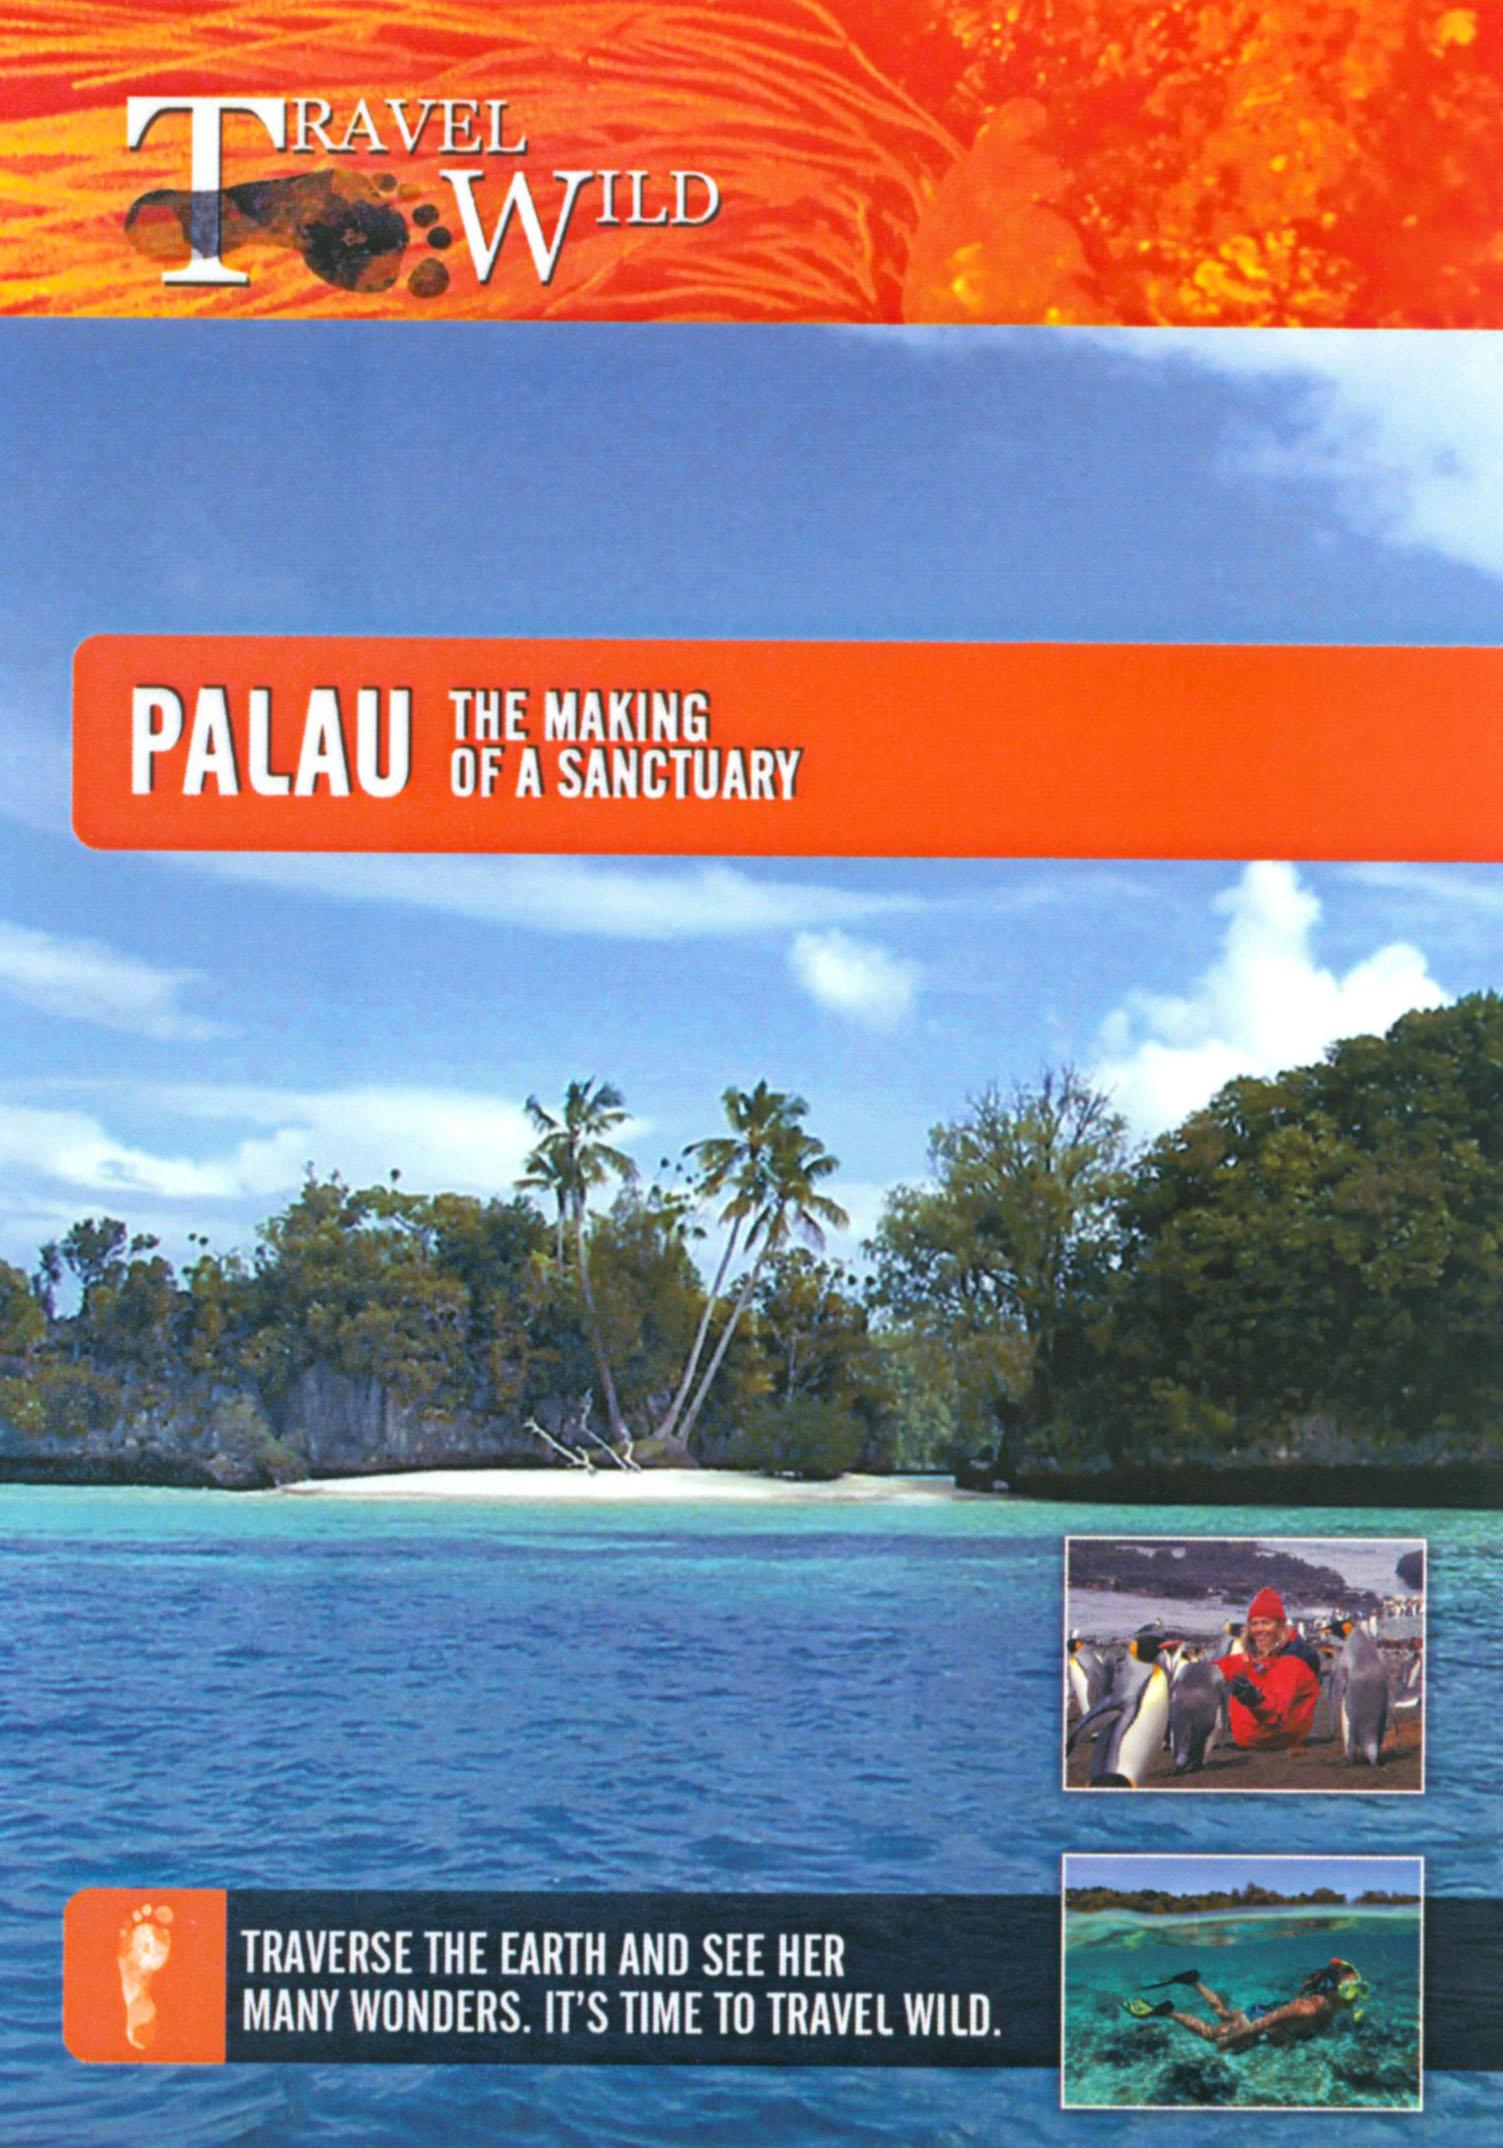 Travel Wild: Palau - The Making of a Sanctuary